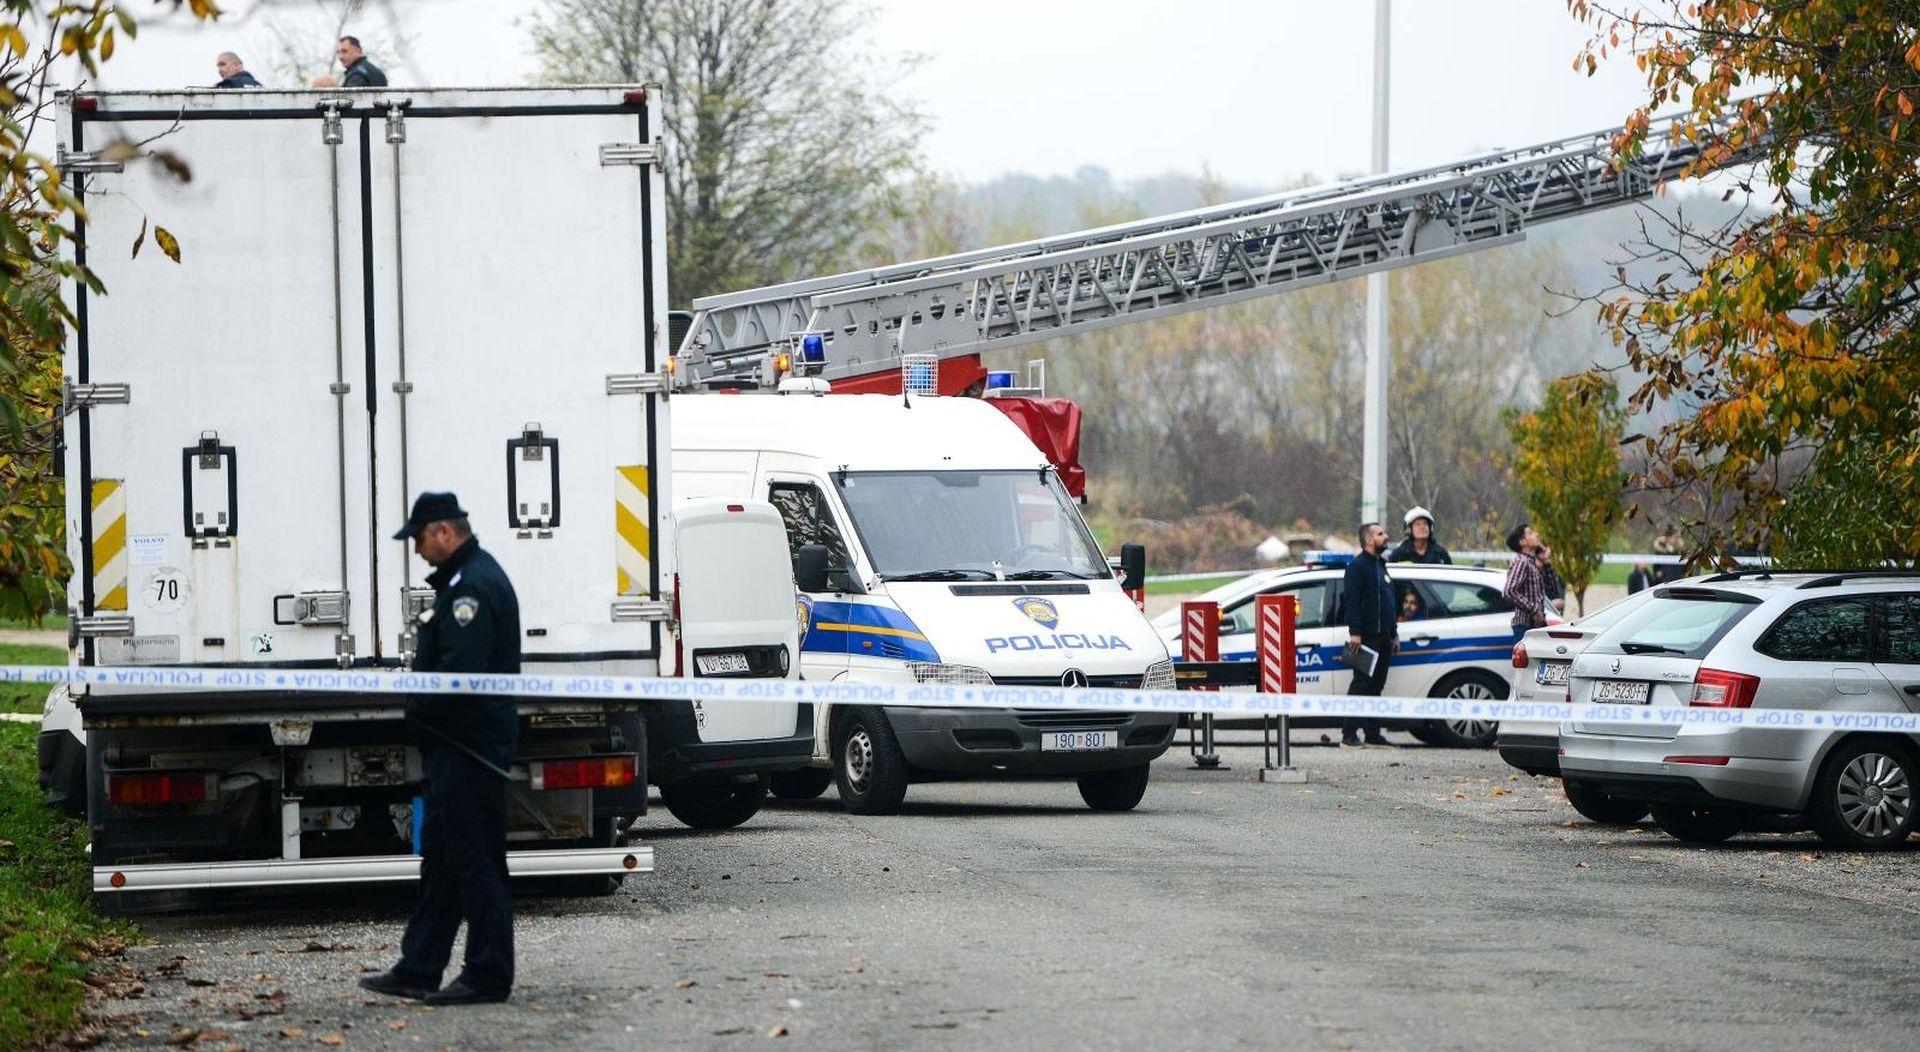 FOTO: Zagrebačka policija iz kamiona izvlačila sumnjive pakete